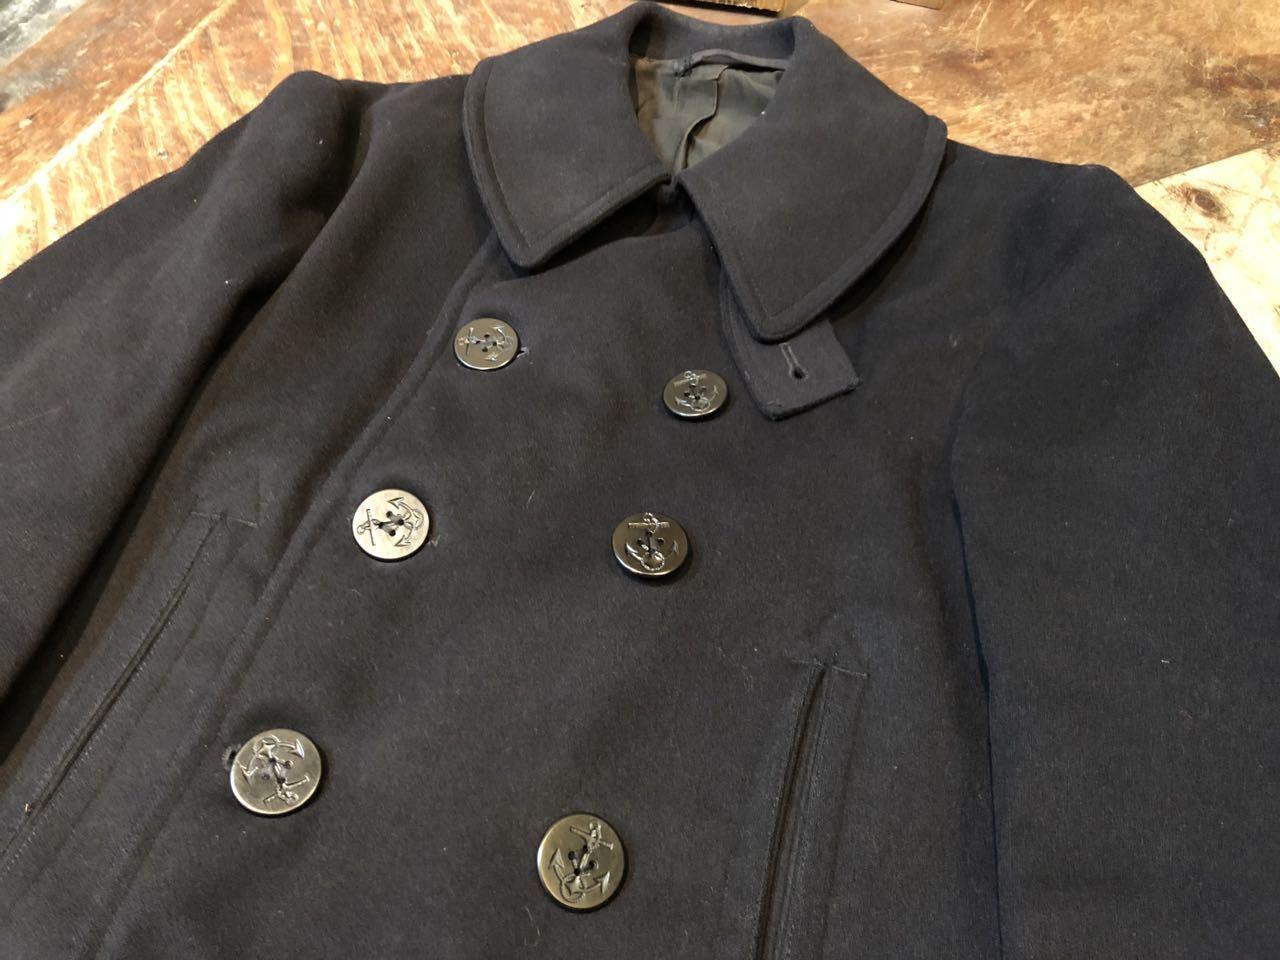 12月14日(土)入荷!U.S NAVY 40s WWⅡ 10ボタン P-COAT  Pコート!_c0144020_14133924.jpg